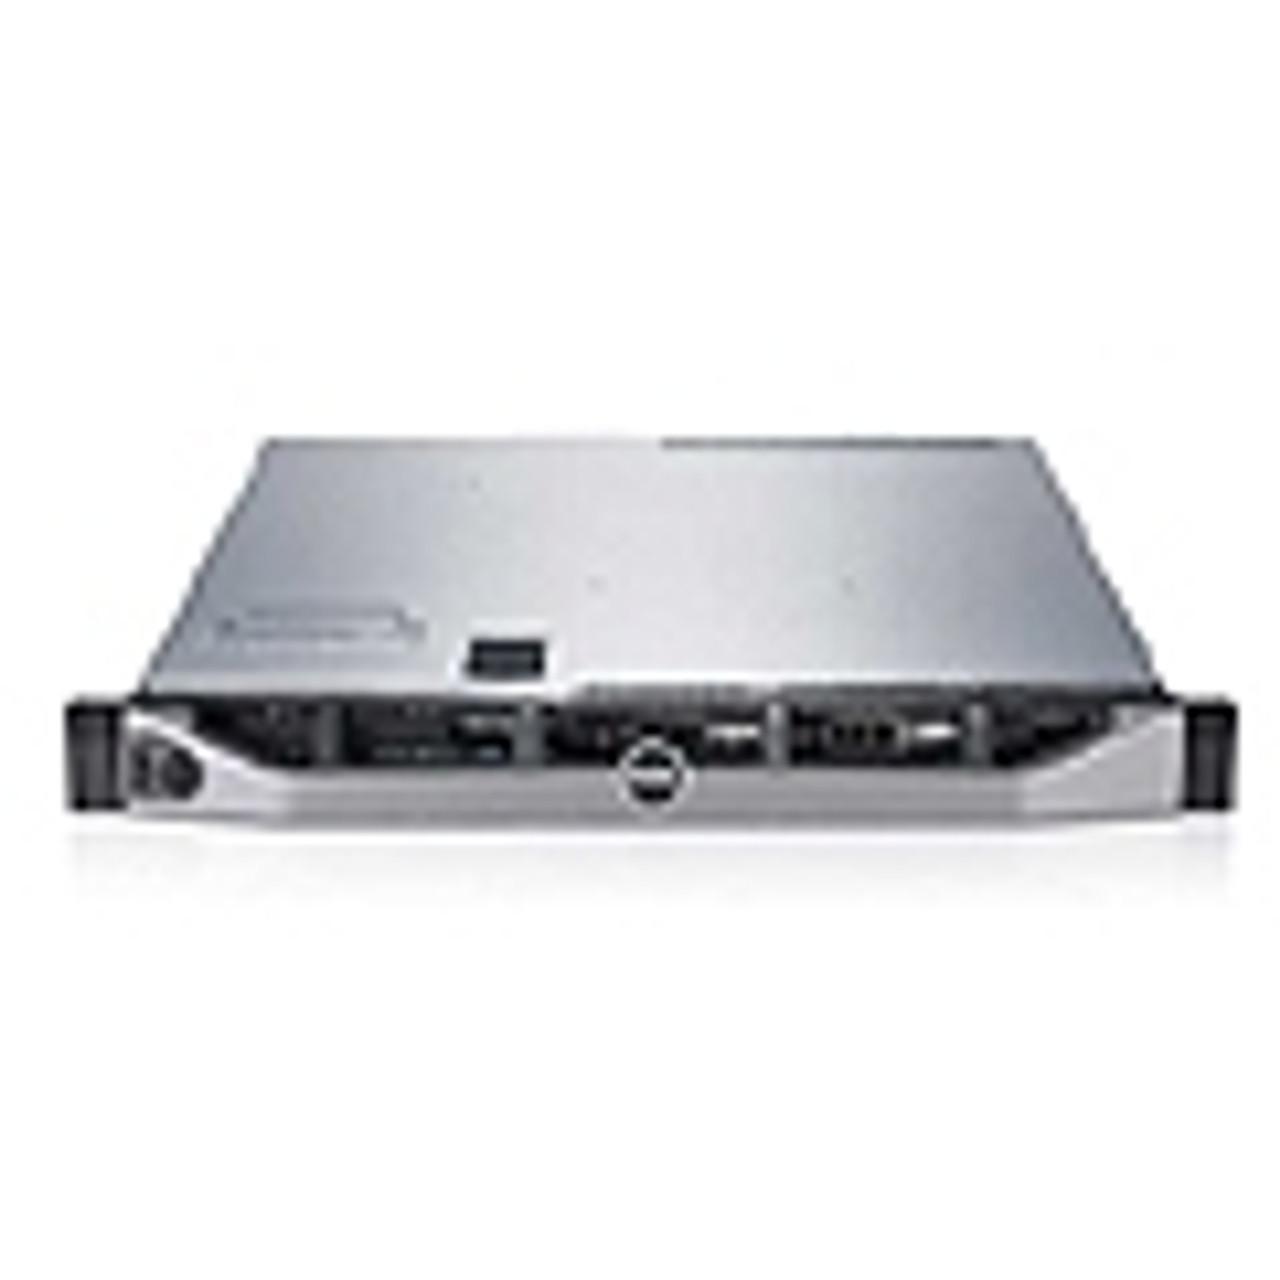 Dell PowerEdge R420 Servers